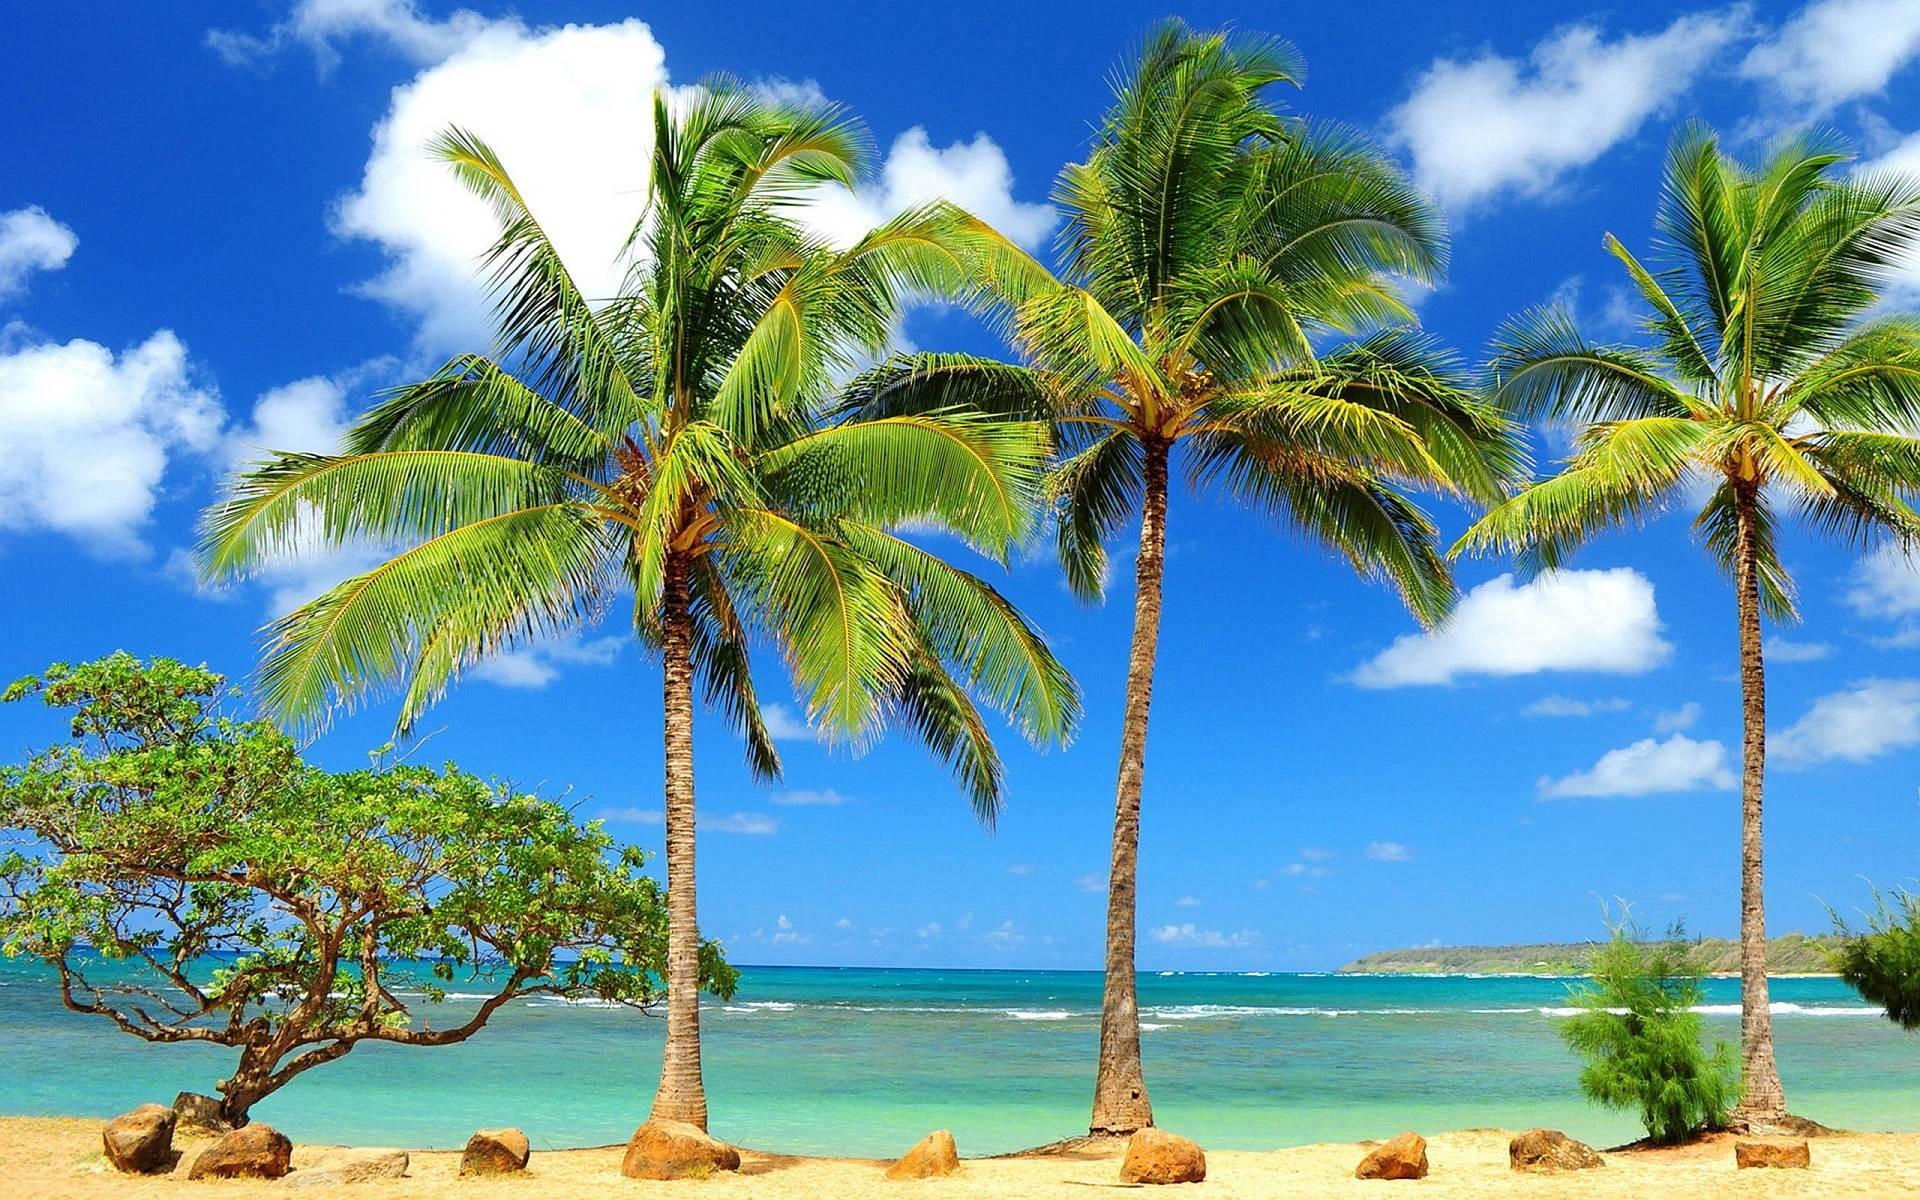 Beach Palm Trees wallpaper – 1131862